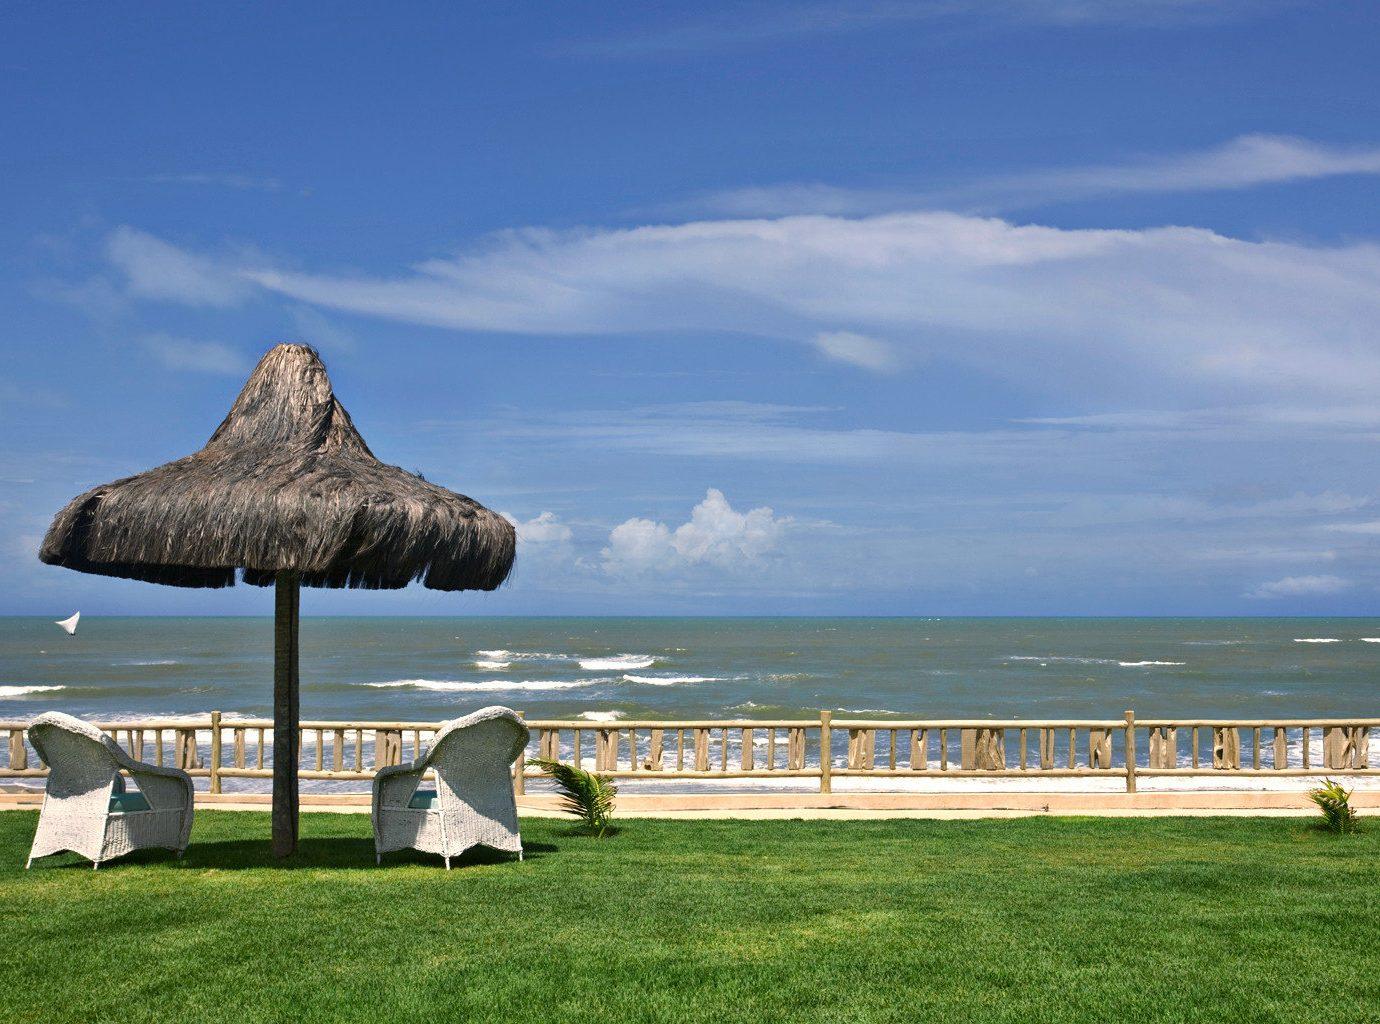 Beach Beachfront Grounds Outdoors Scenic views grass sky Sea shore Ocean horizon Coast cape Island lawn overlooking distance